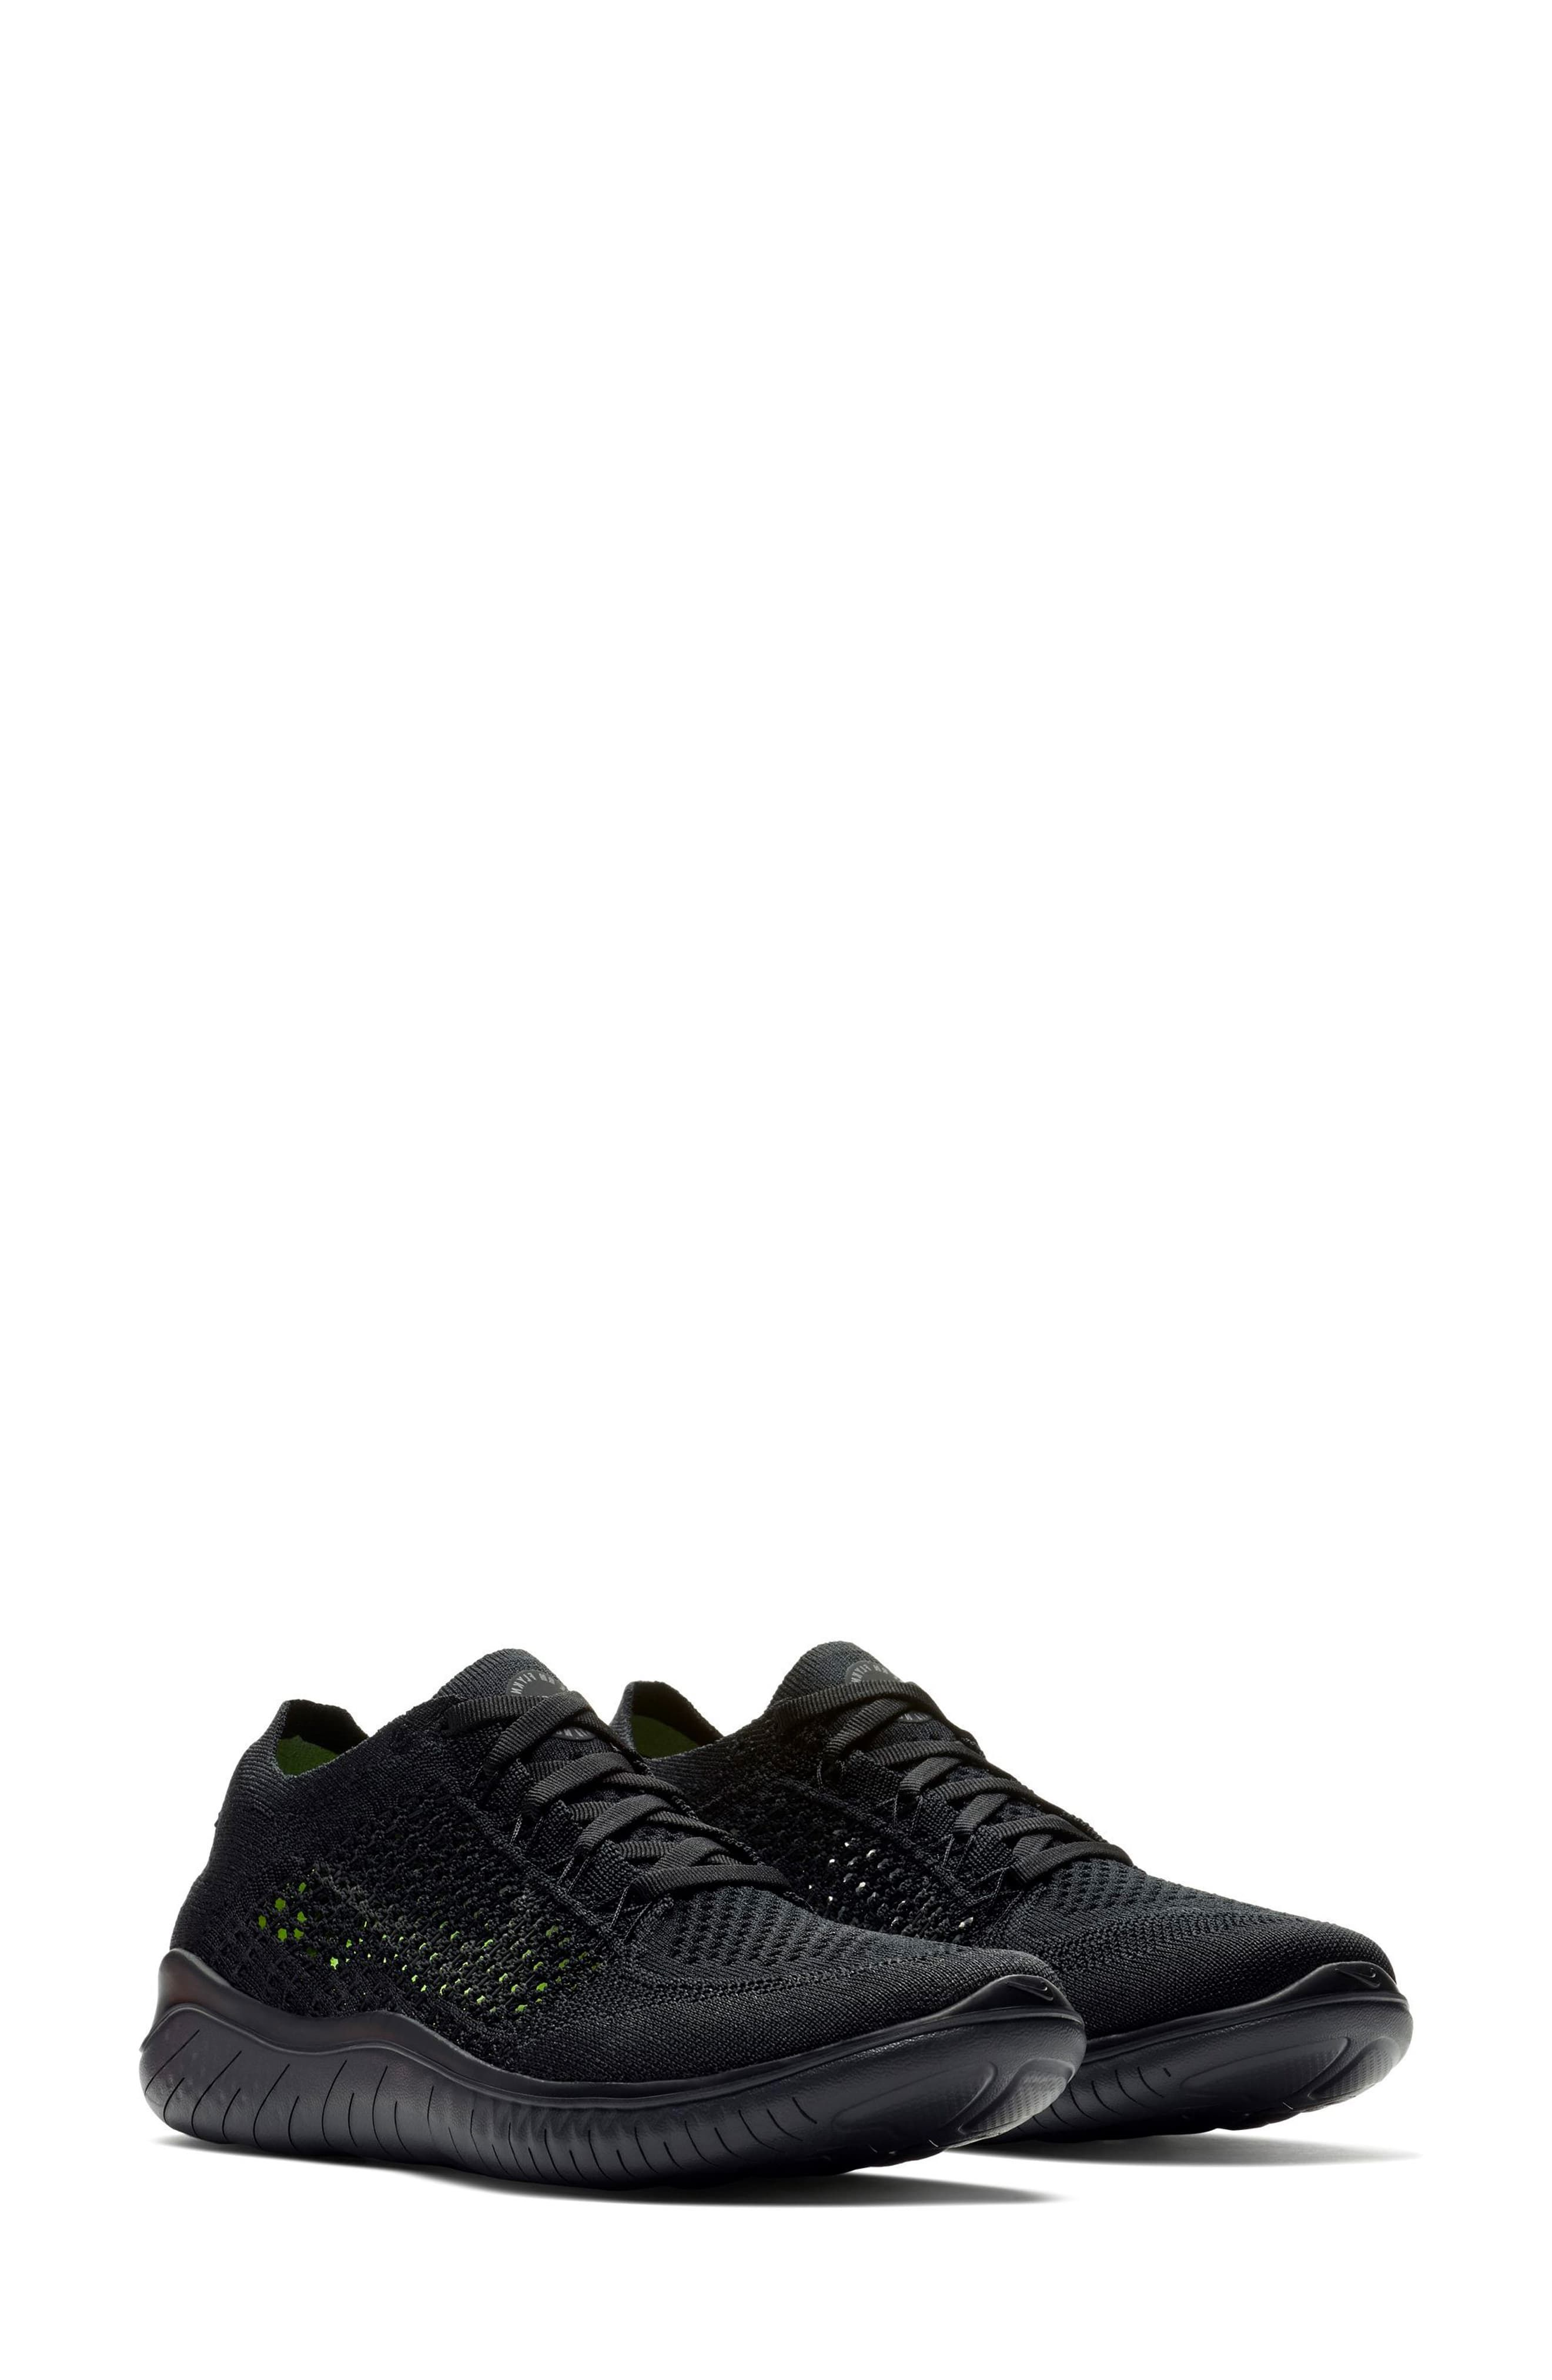 separation shoes cf3a0 24bde Women's Nike Free Rn Flyknit 2018 Running Shoe, Size 6.5 M ...